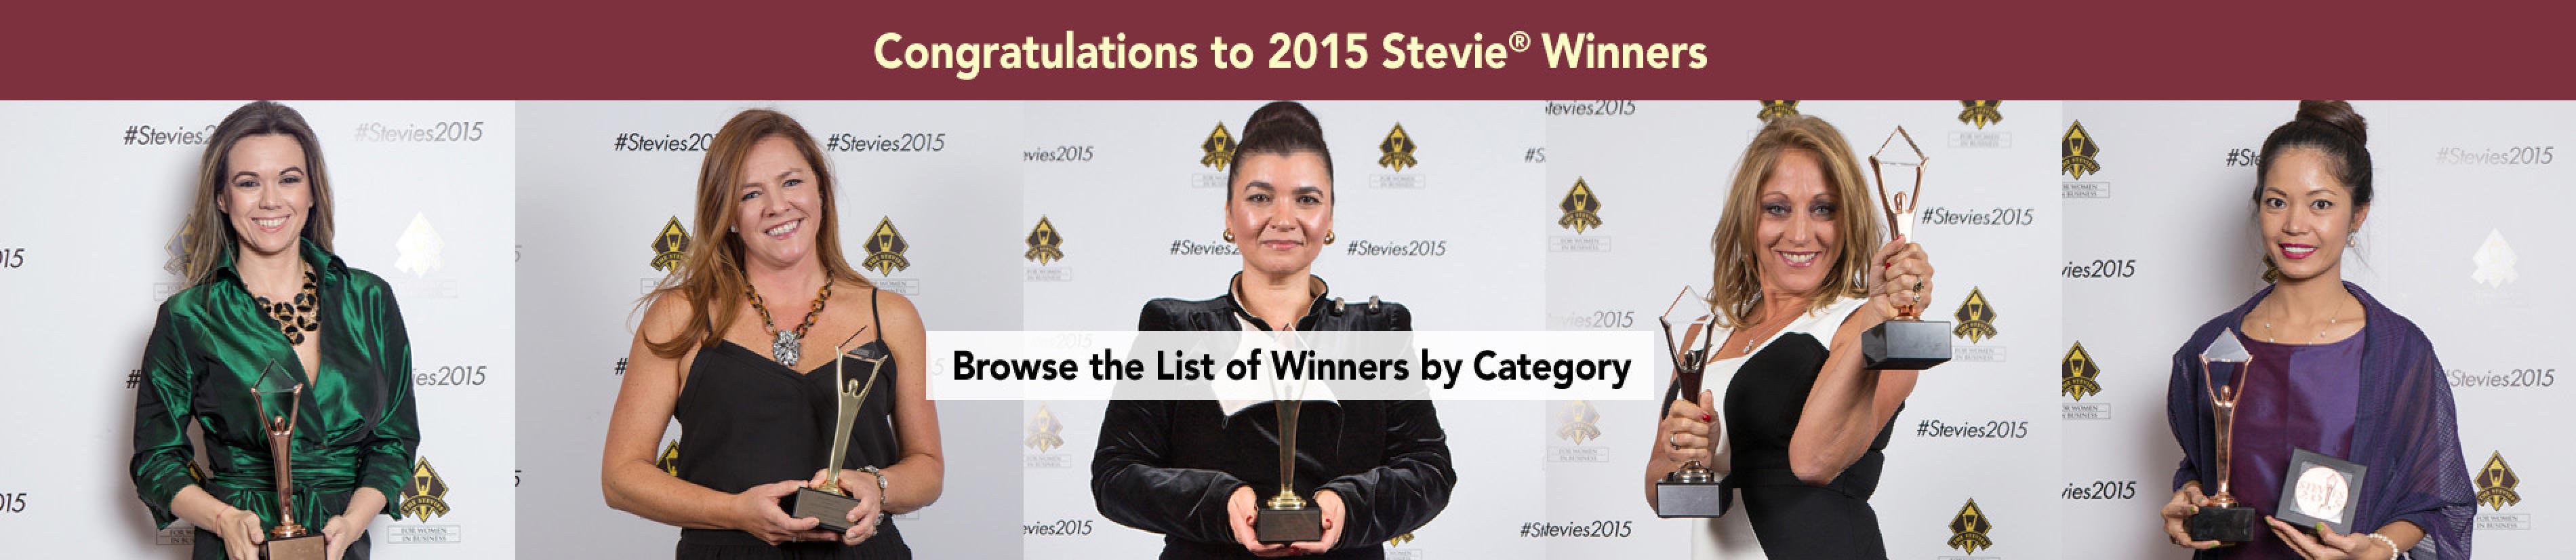 Congratulations to 2015 Stevie Award Winners